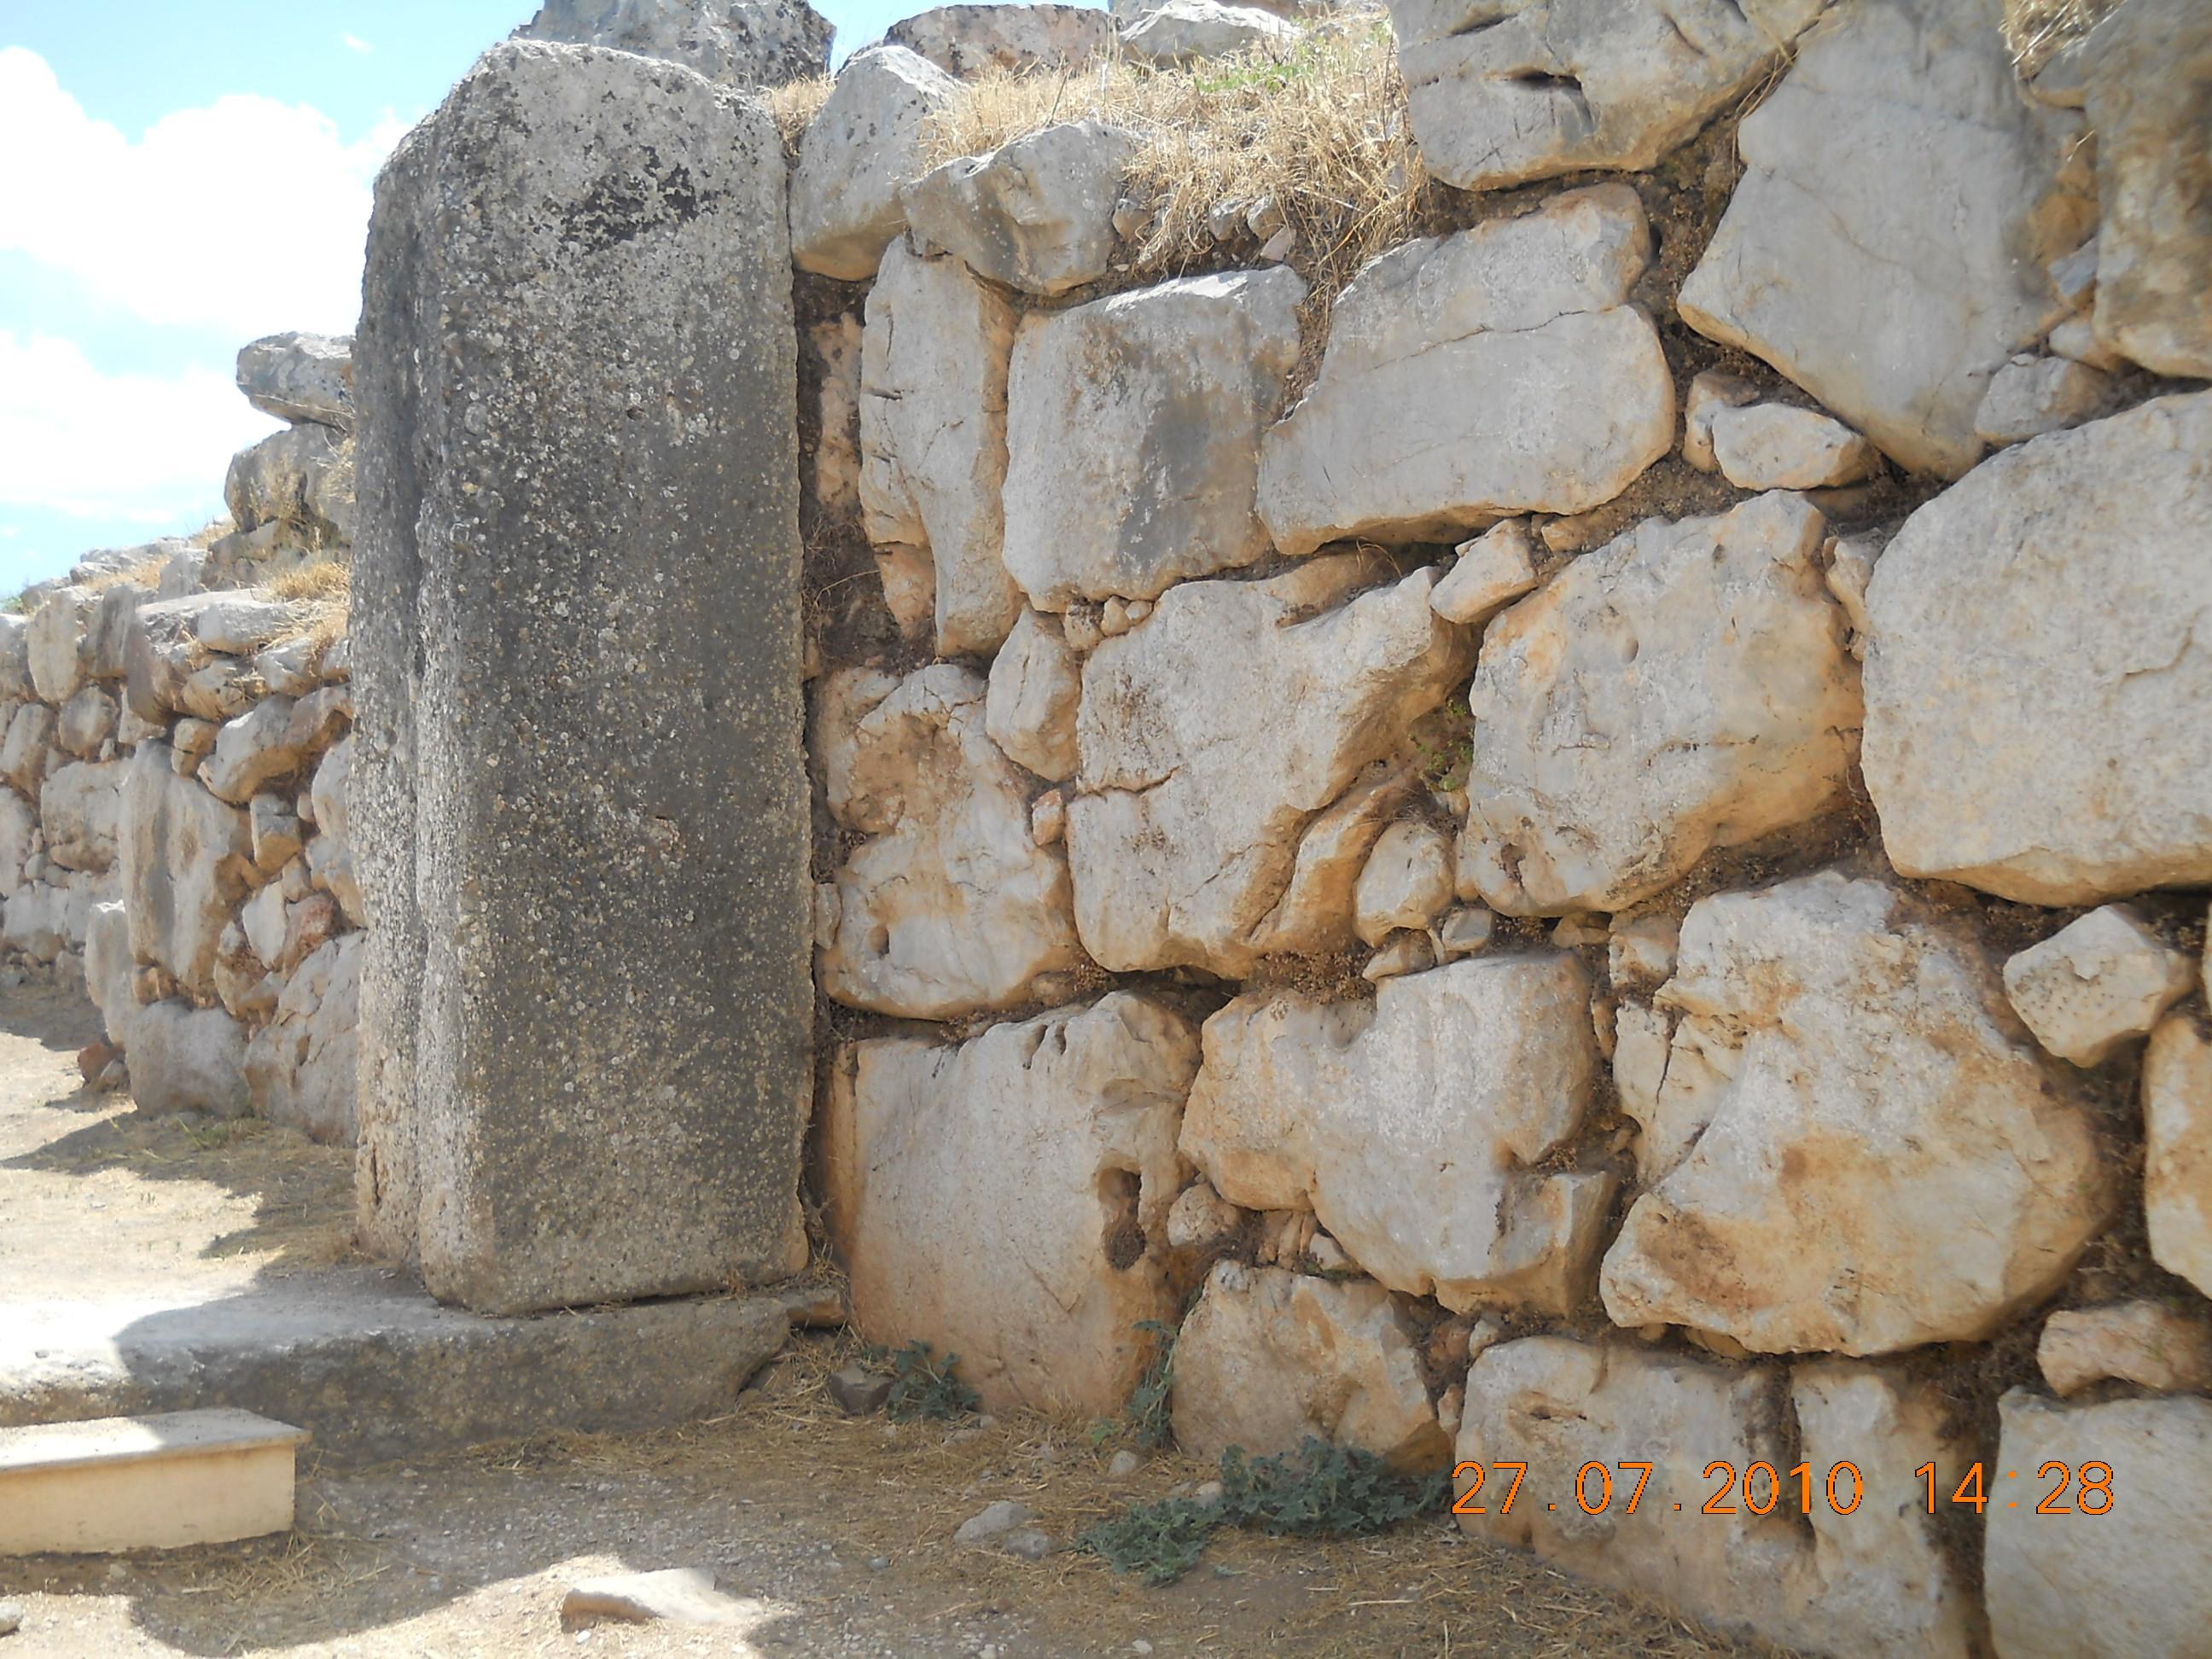 Grecia, Pamint Romanesc - Page 15 - Călătorii - Daewoo